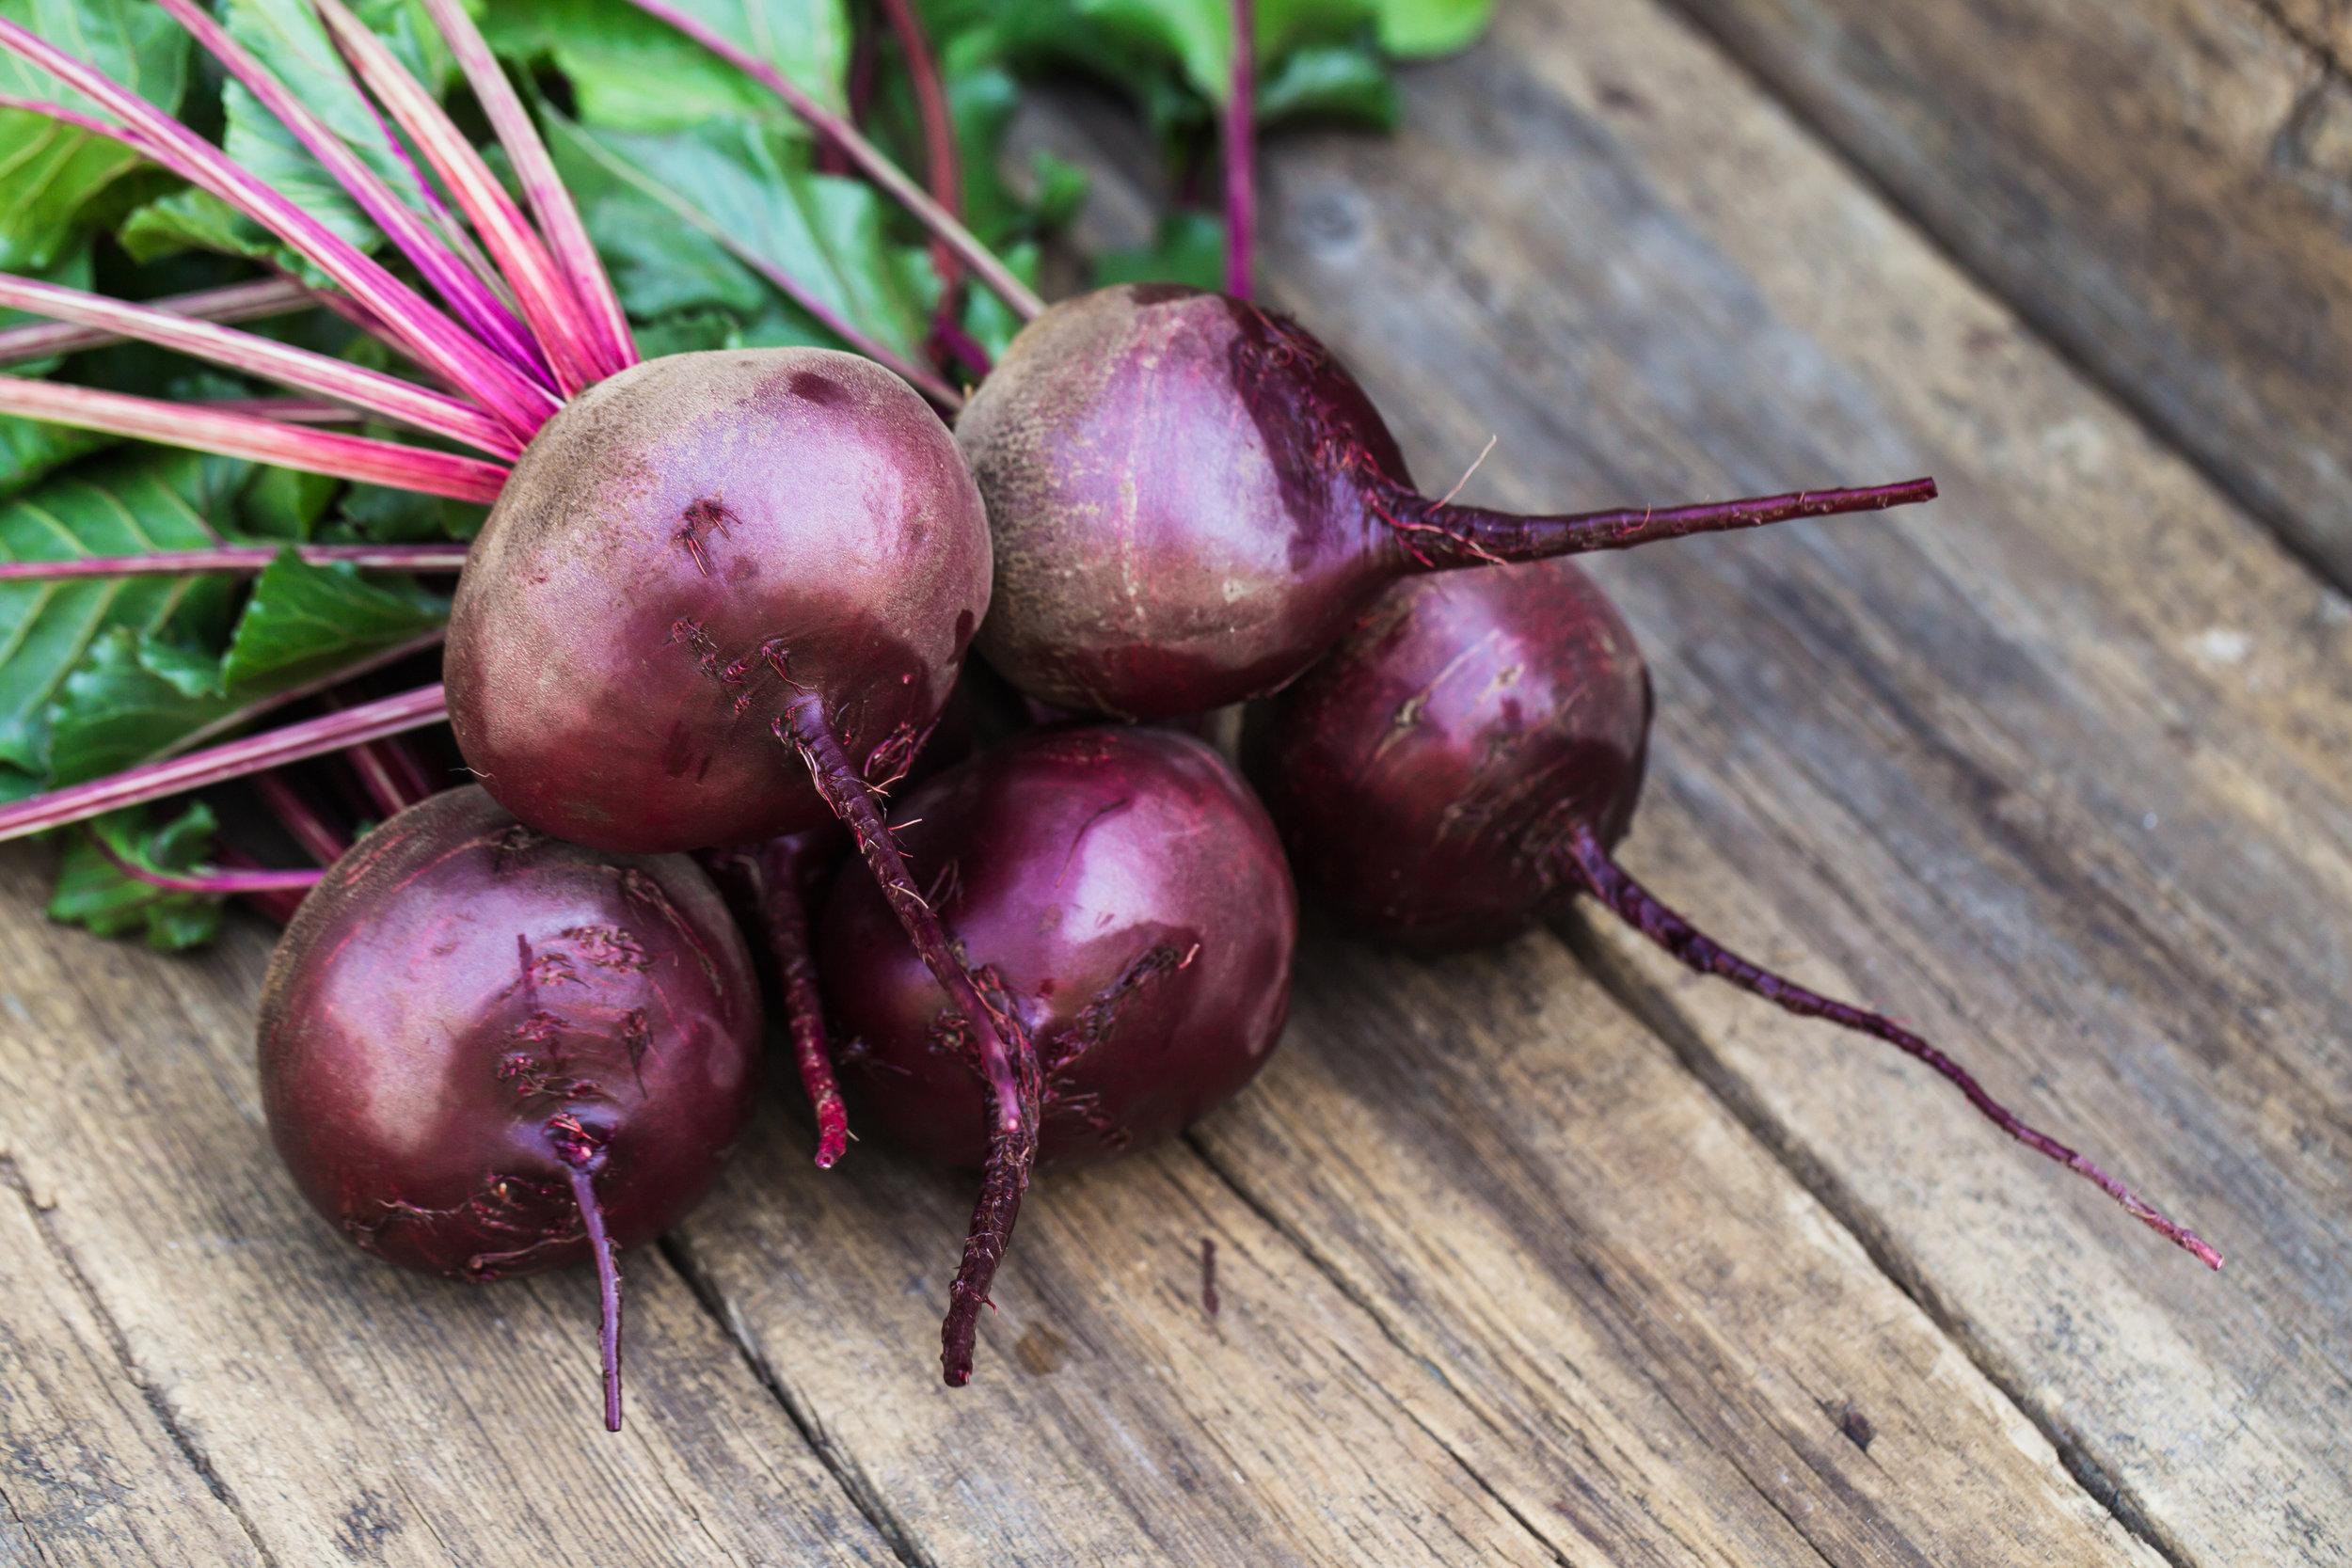 RECIPE: Baby Beet Salad - July 3, 2018